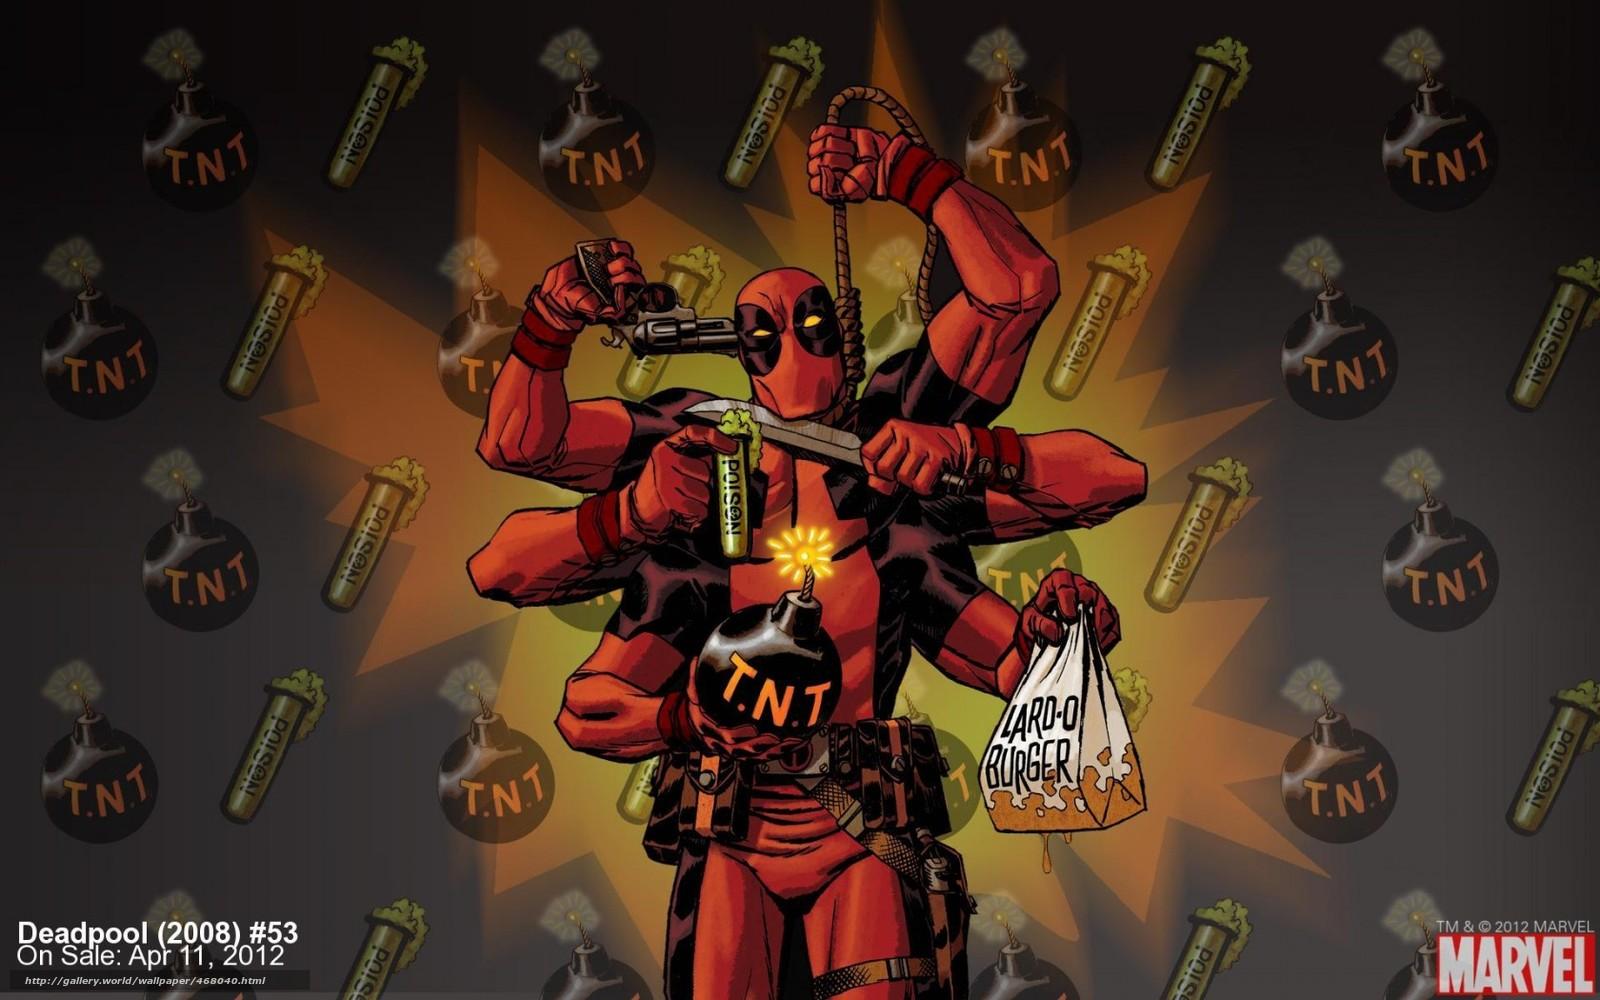 Descargar gratis Deadpool,  un superhroe,  tira cmica,  suicidio Fondos de escritorio en la resolucin 1680x1050 — imagen №468040